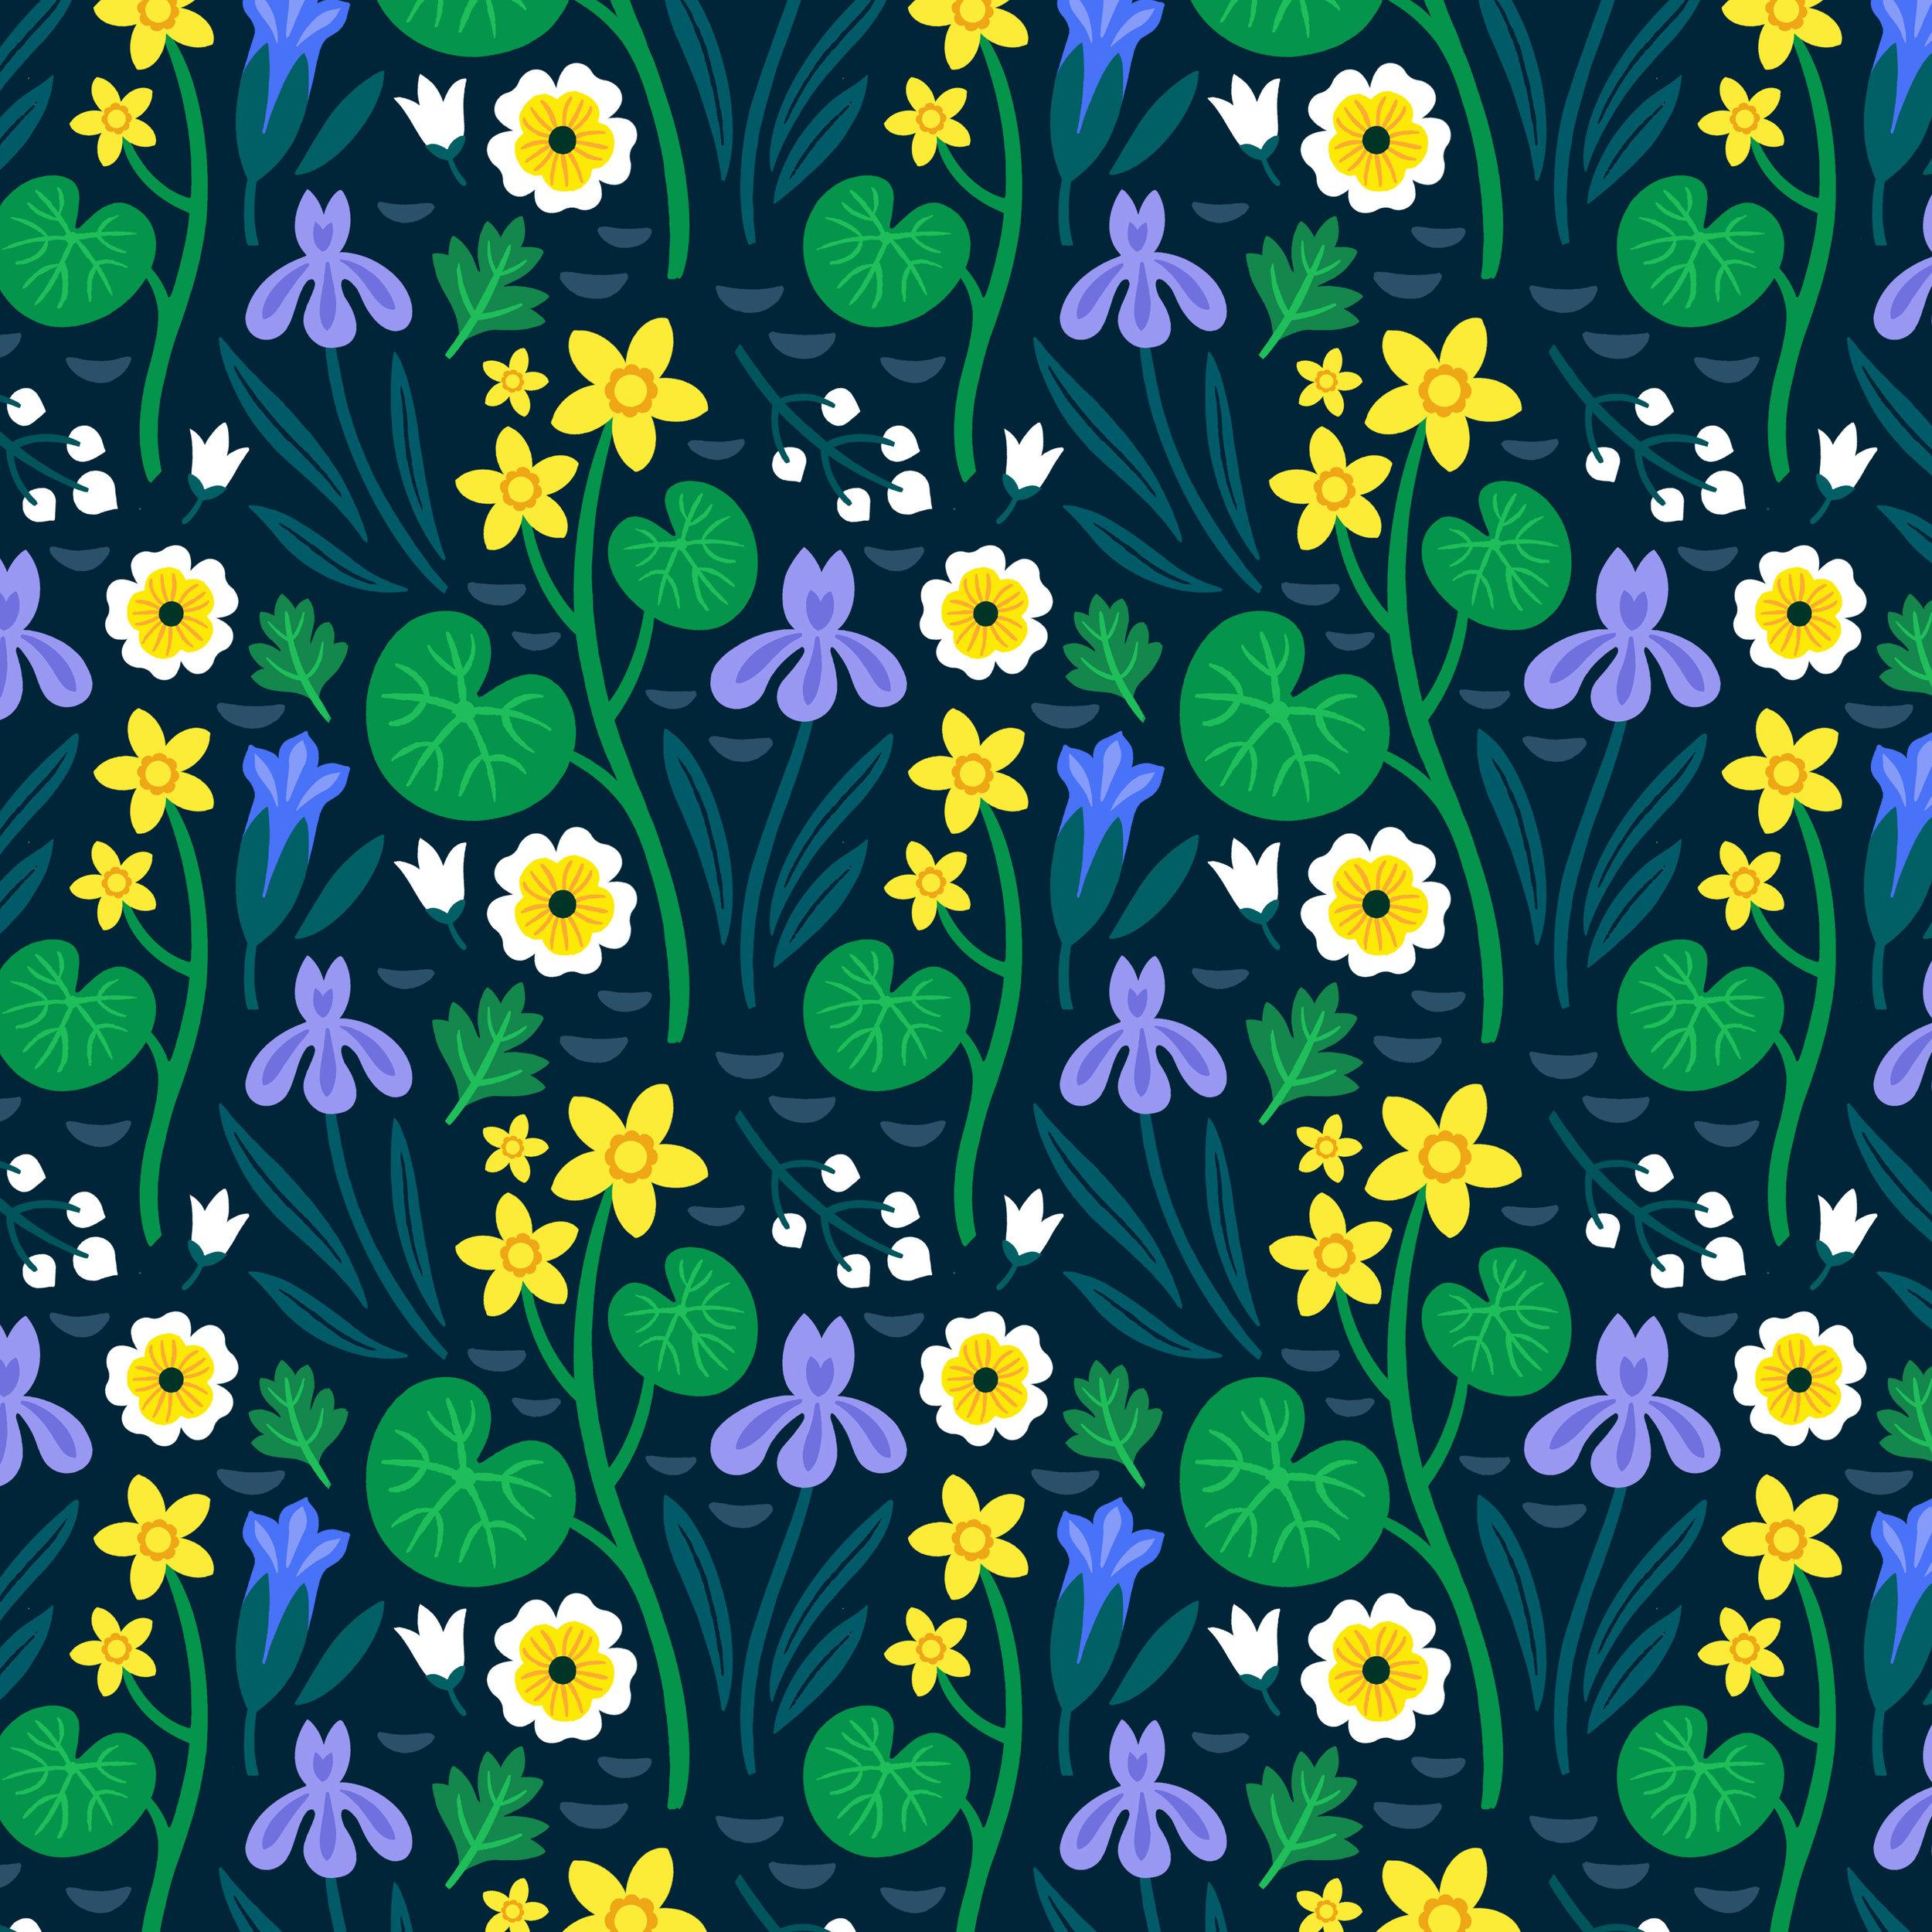 Marsh plants pattern2.jpg